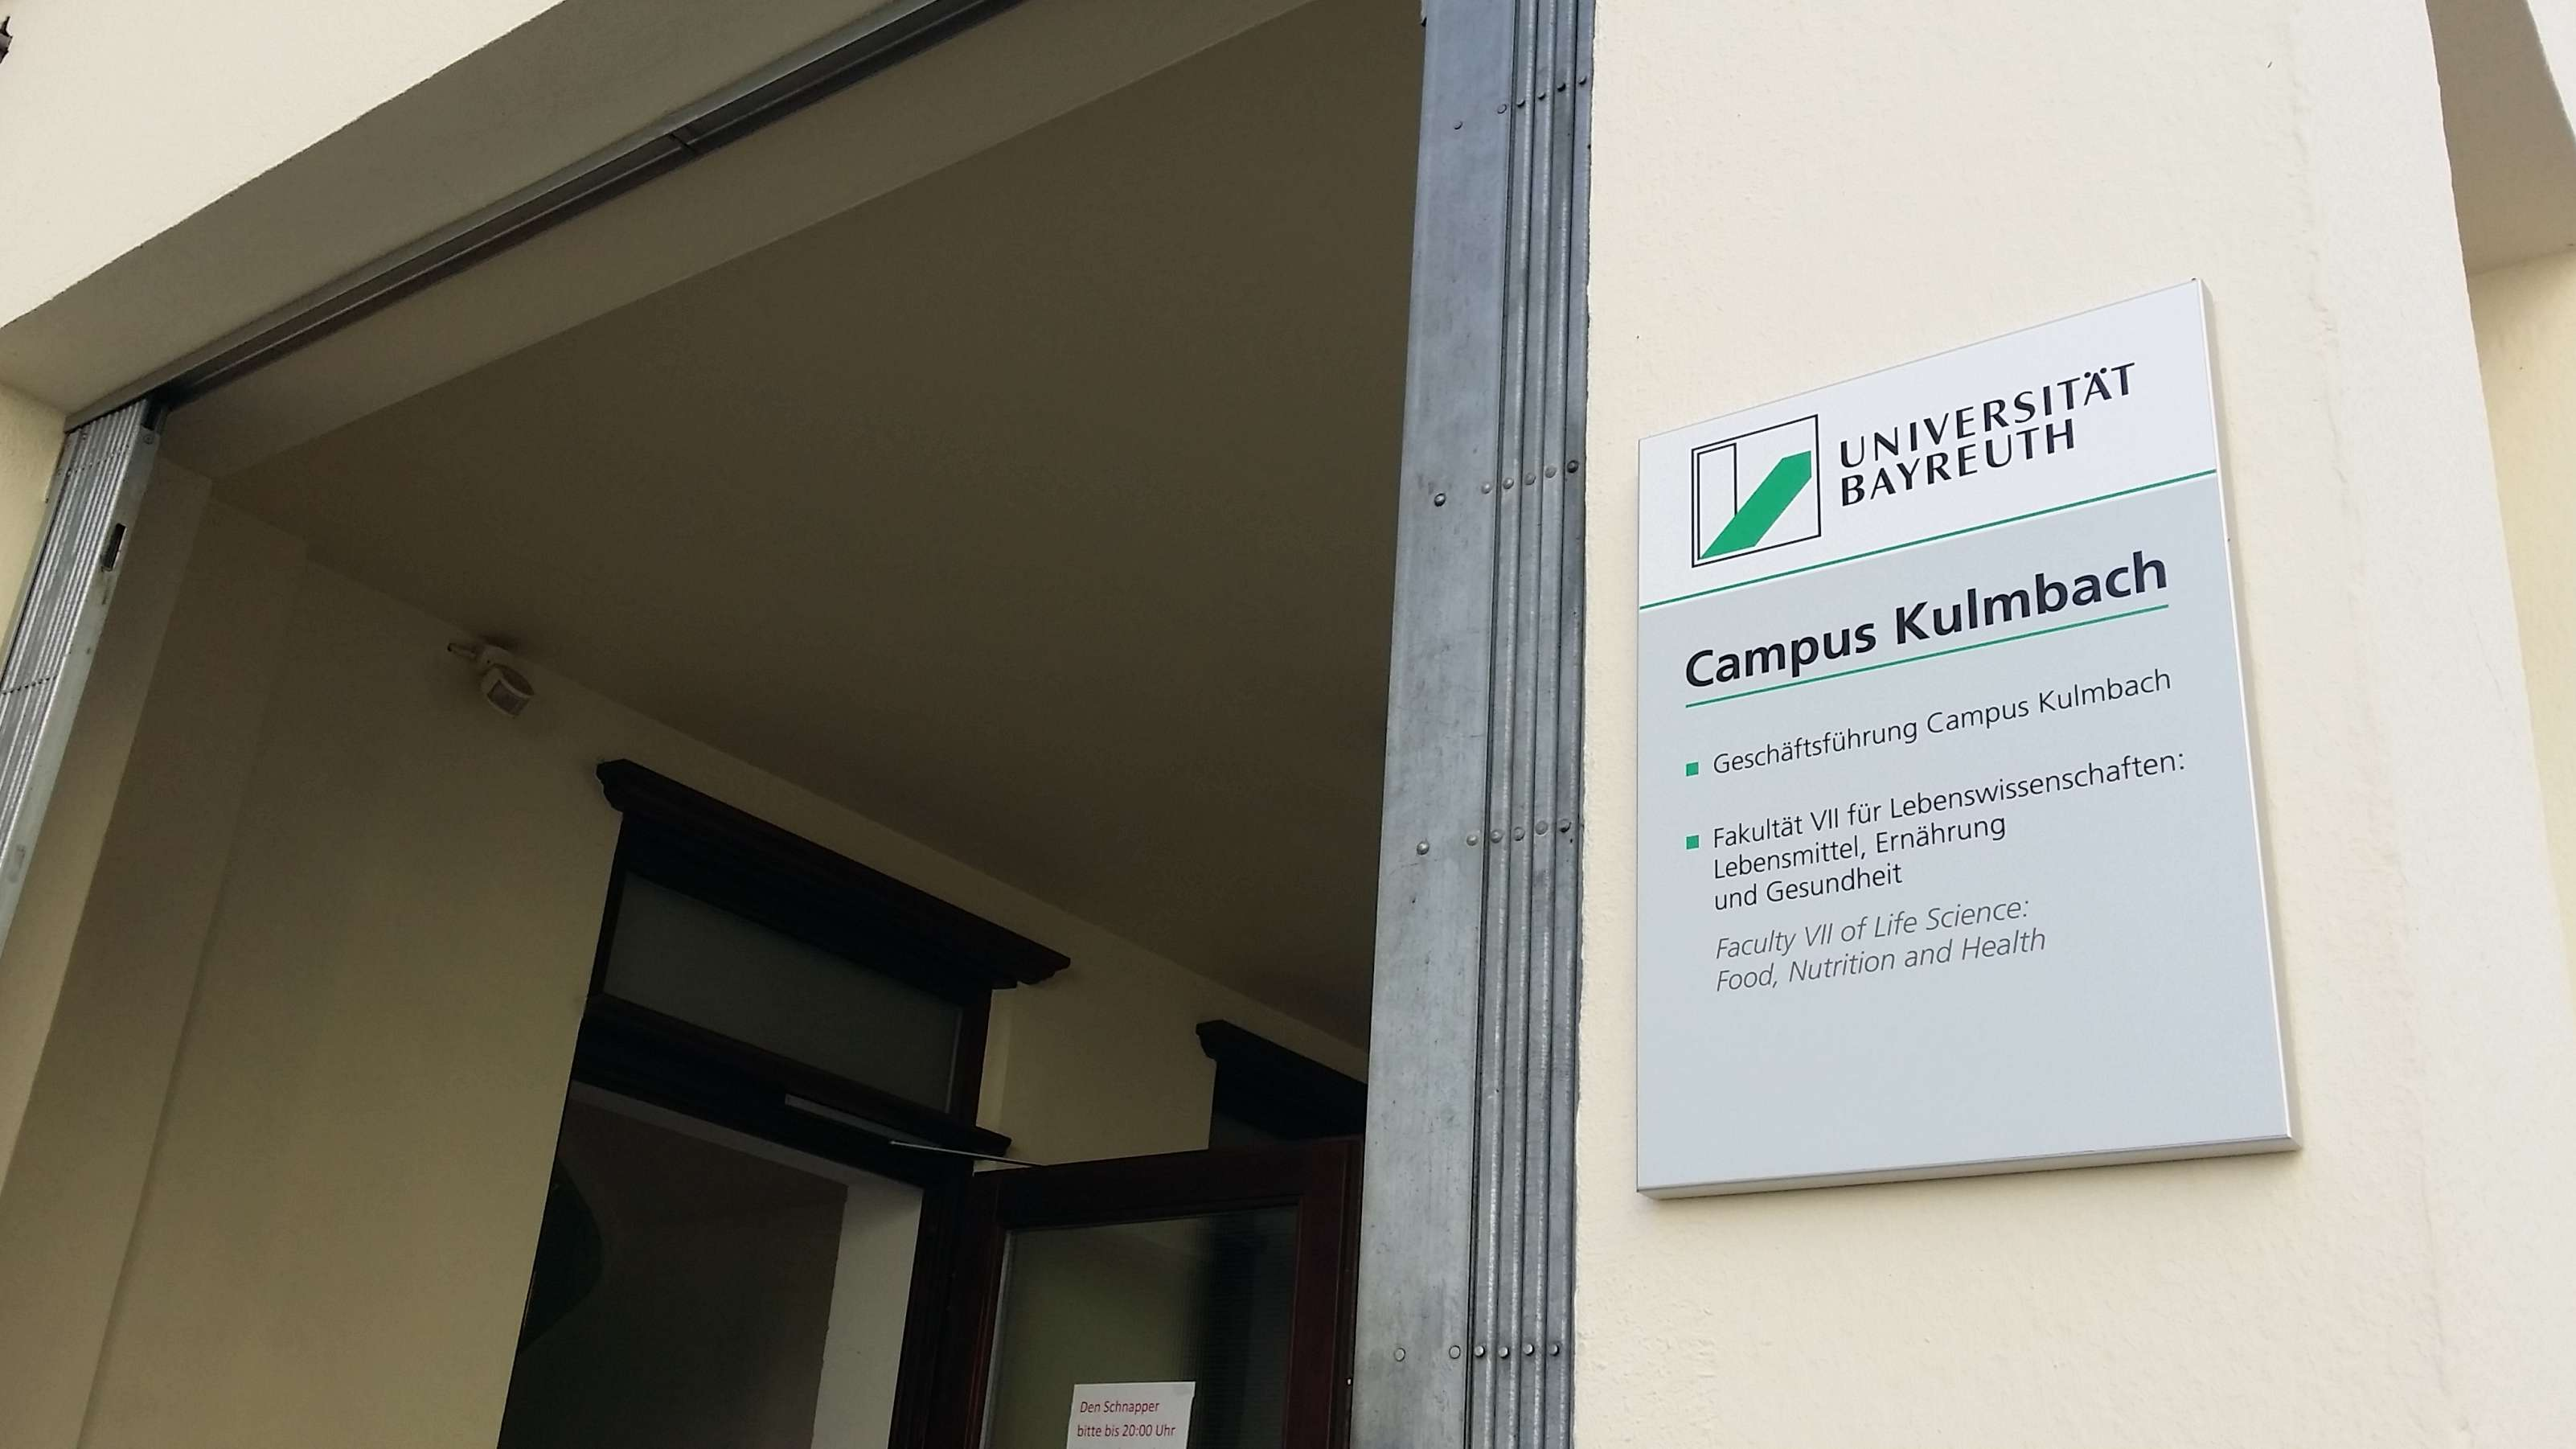 Campus Kulmbach der Uni Bayreuth